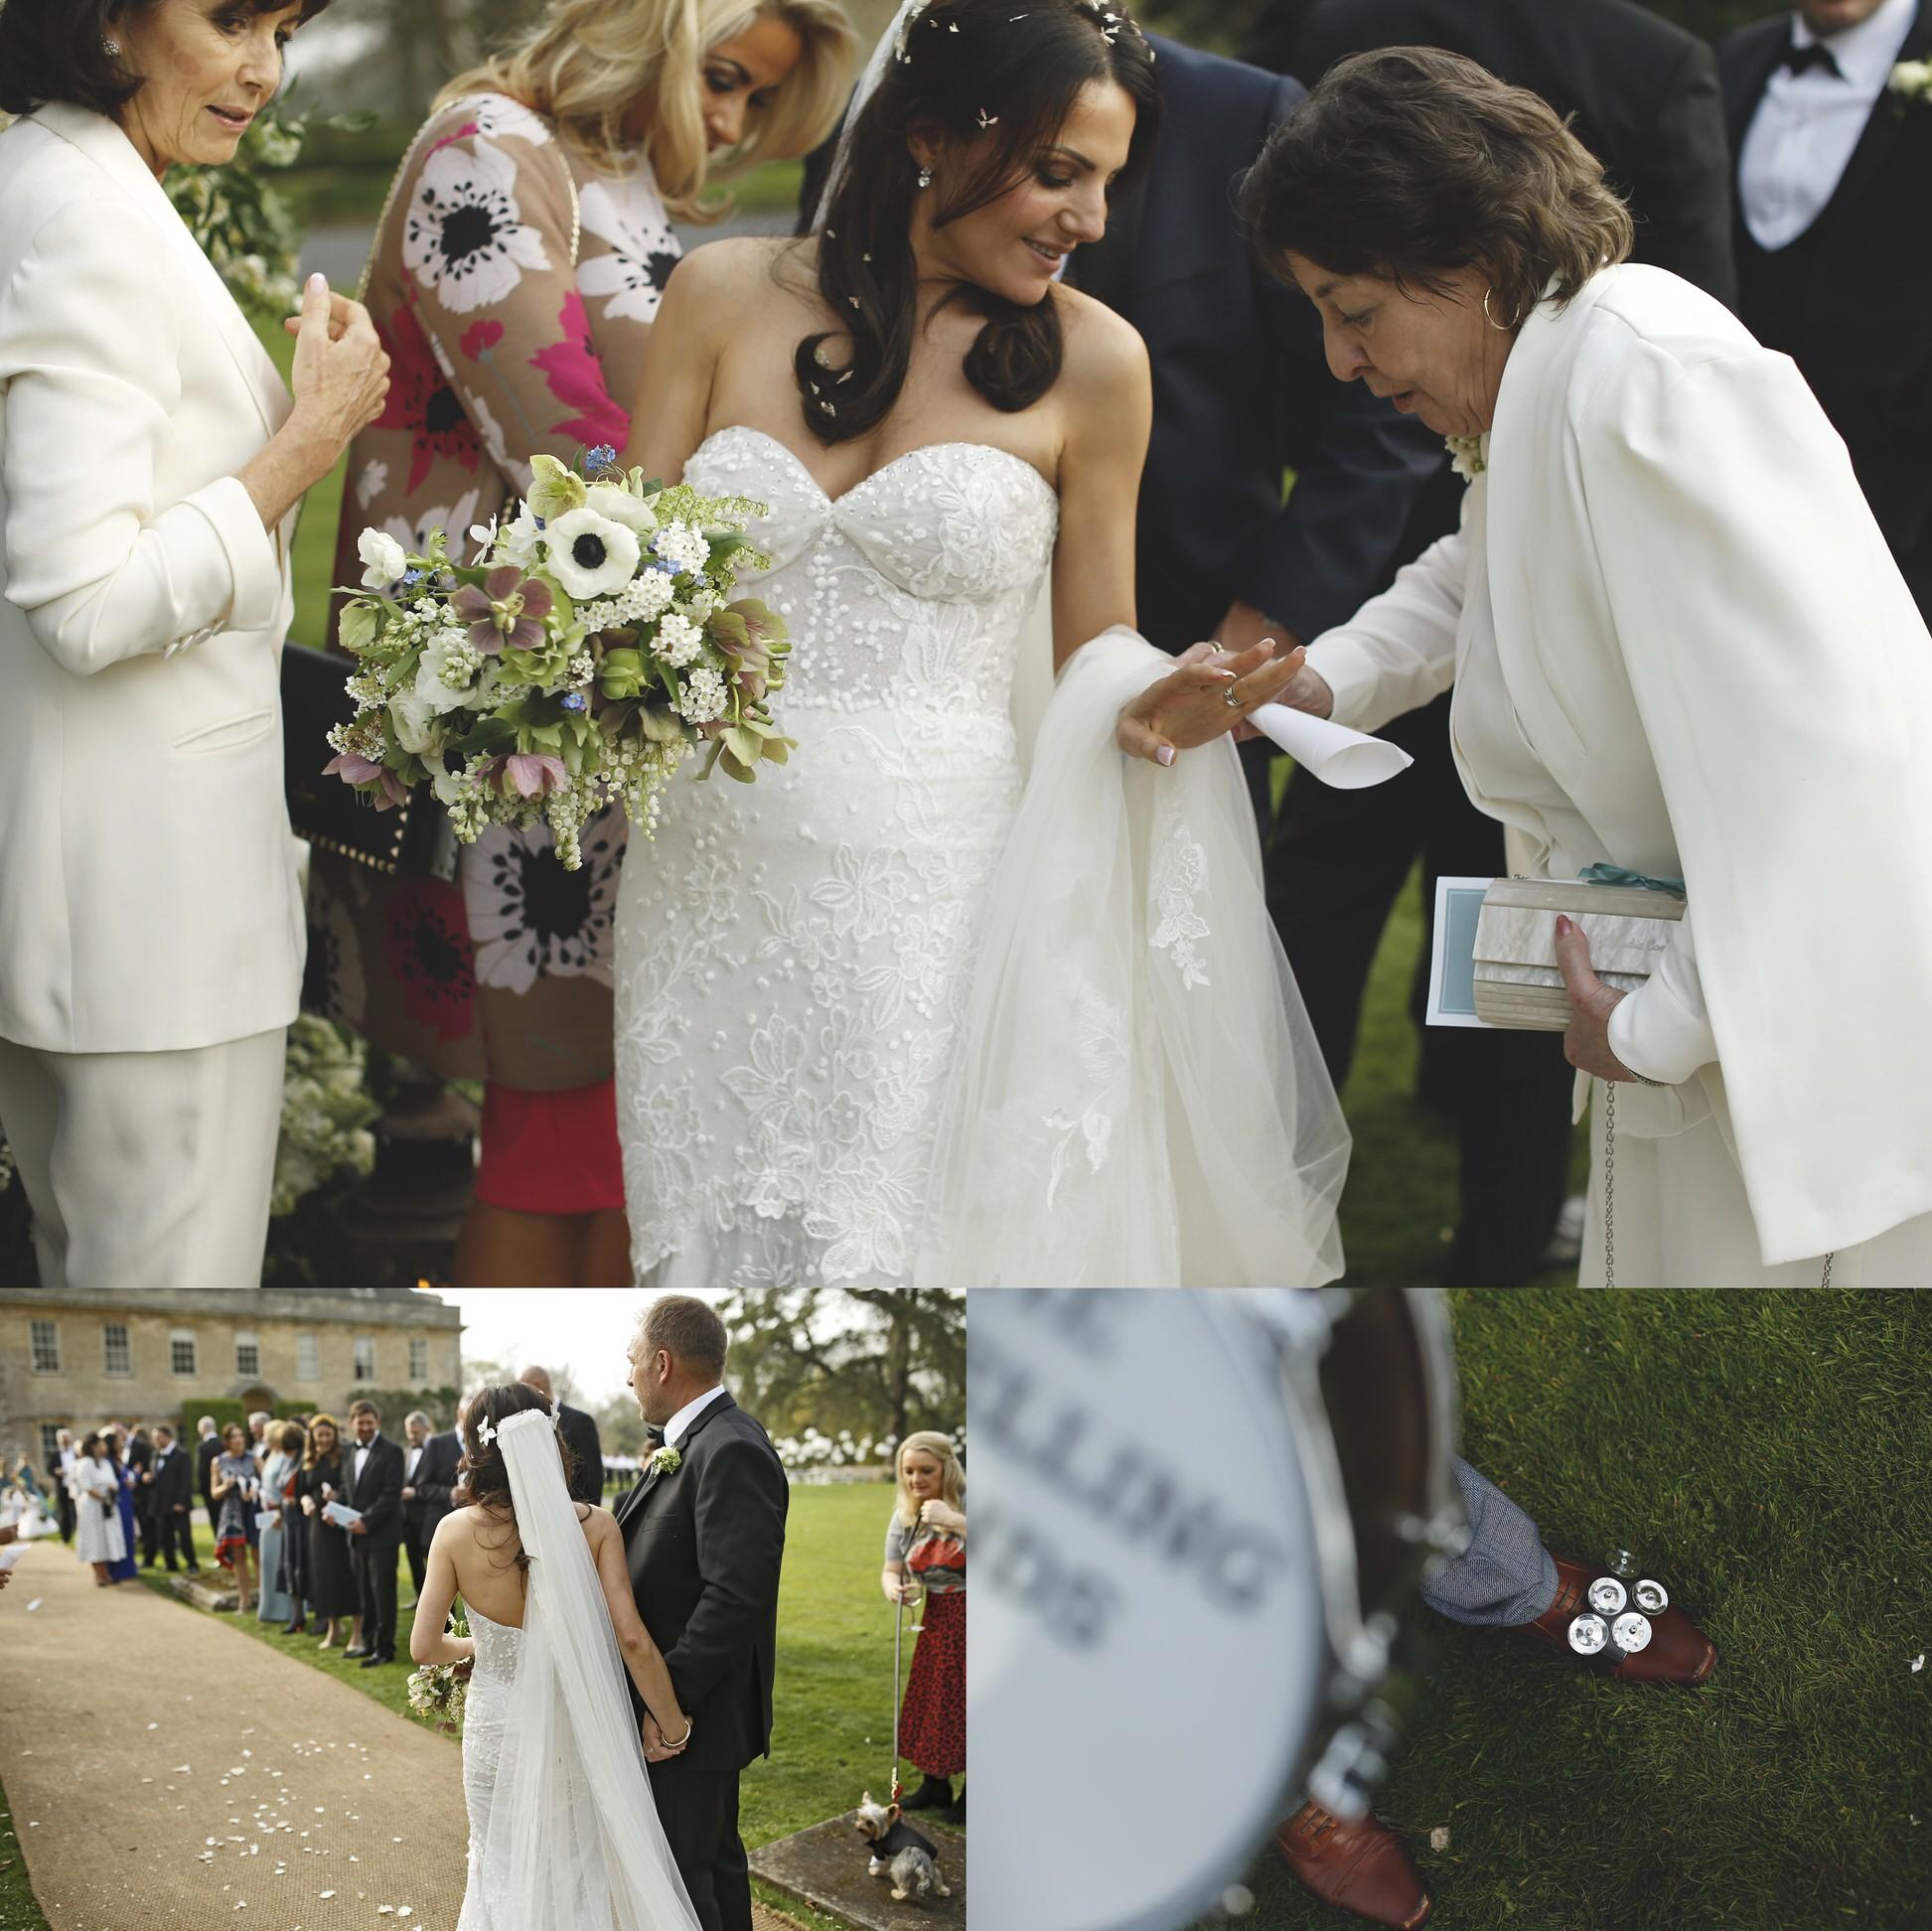 brettharkness-luxury-wedding-photographer-uk_0033.jpg